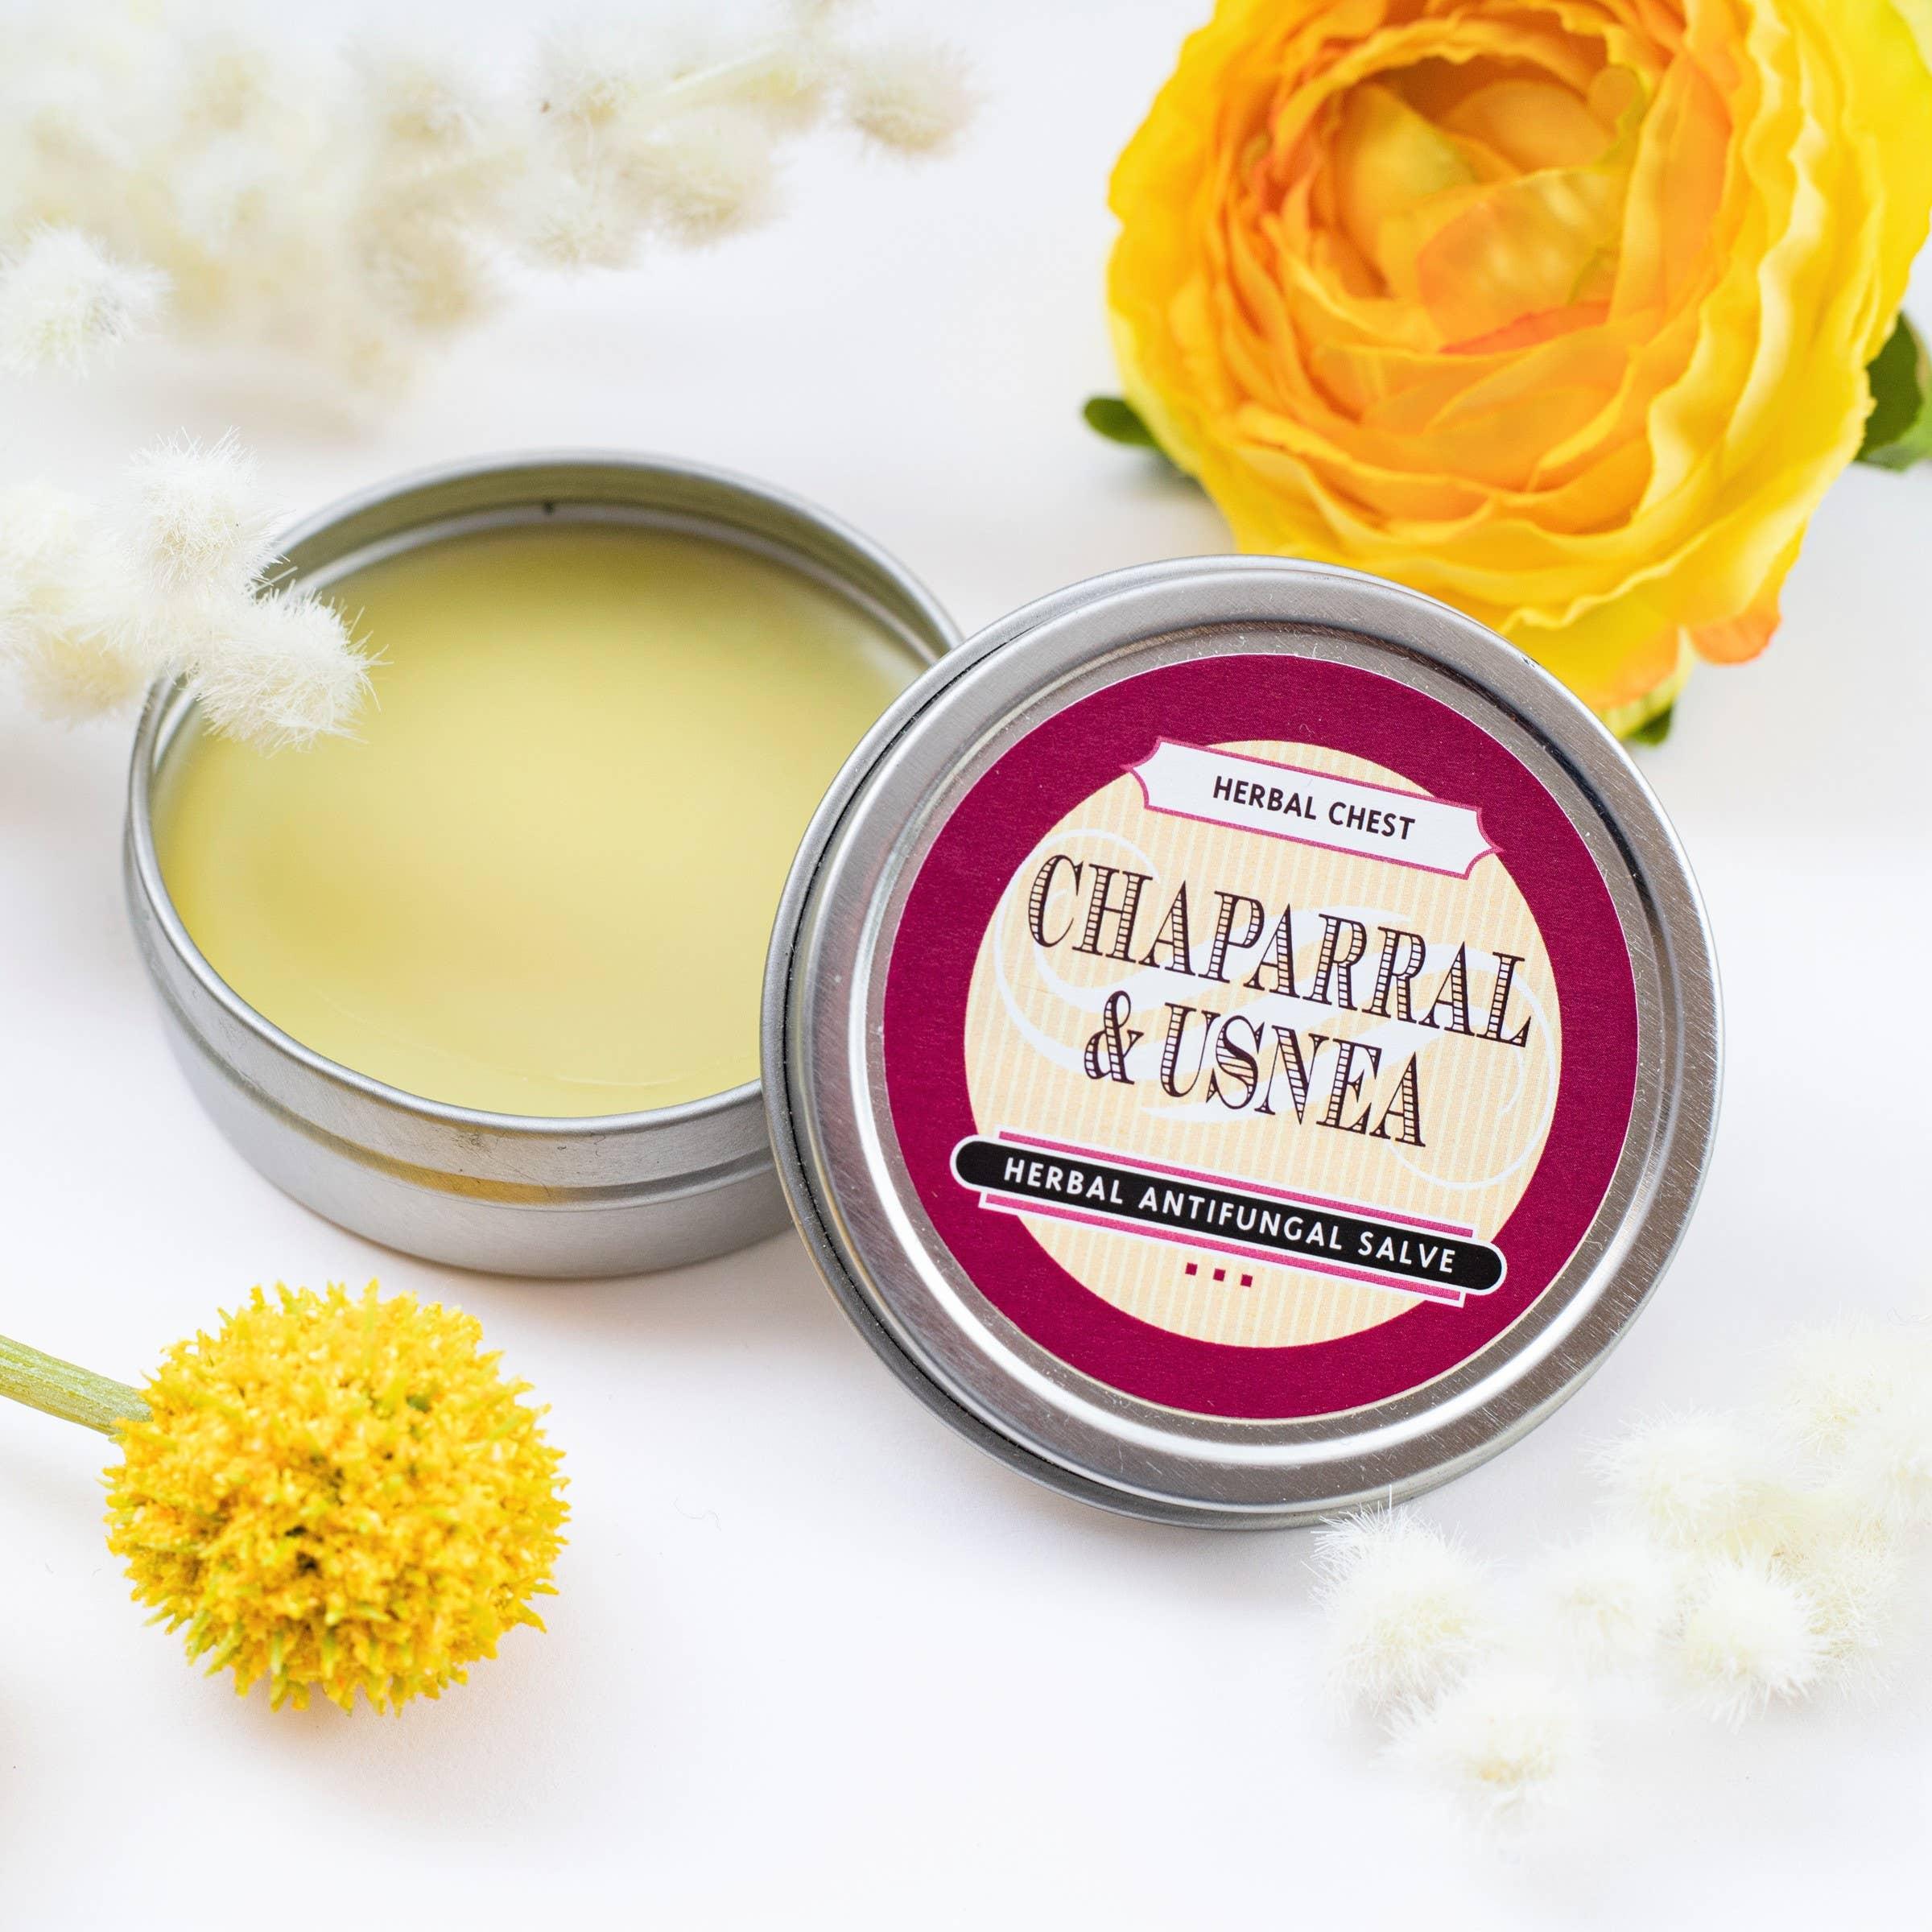 Anti Fungal Salve - Chaparral Herbal Healing Cream | Trada Marketplace